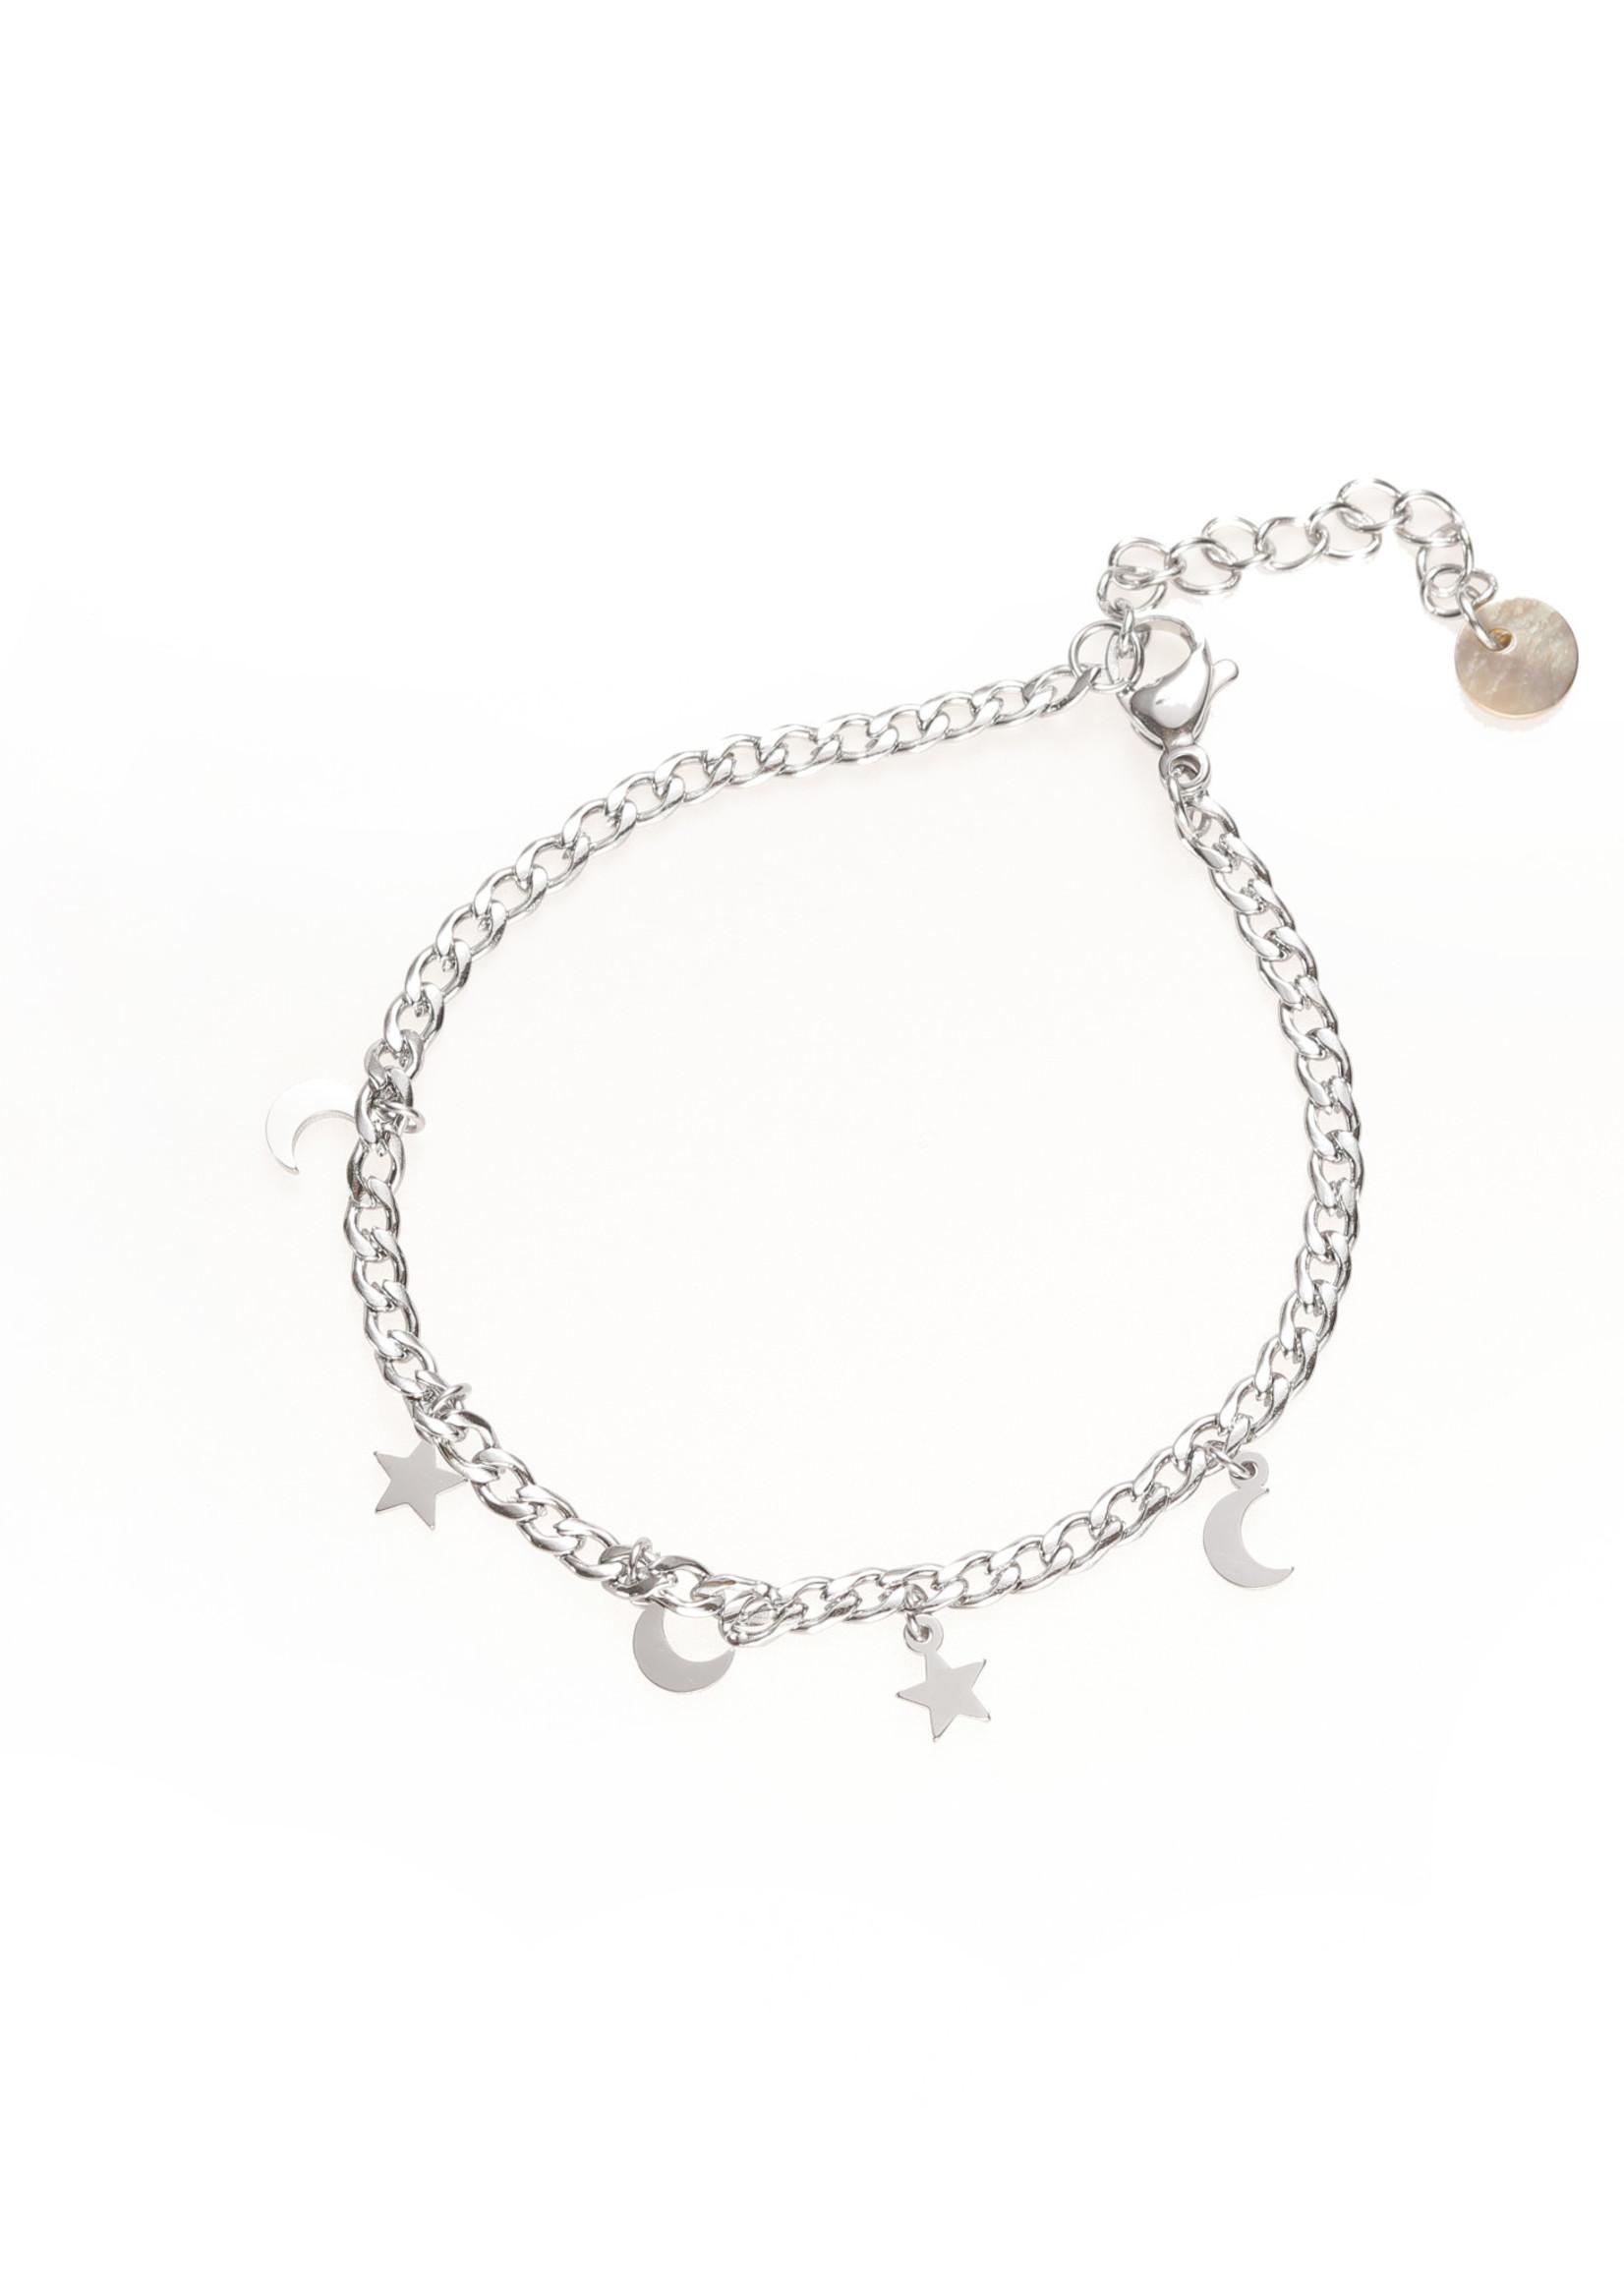 Armband zilver sterretjes en maantjes B1773-1